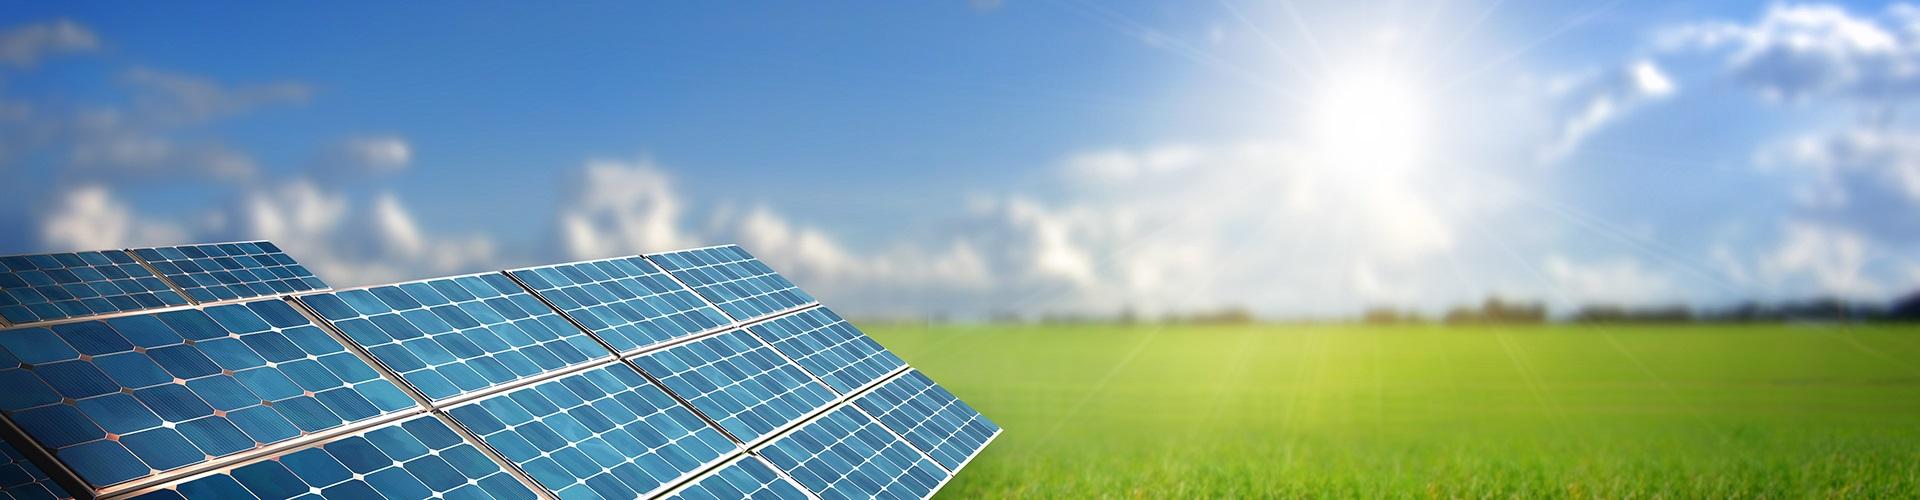 energie rinnovabili impianti